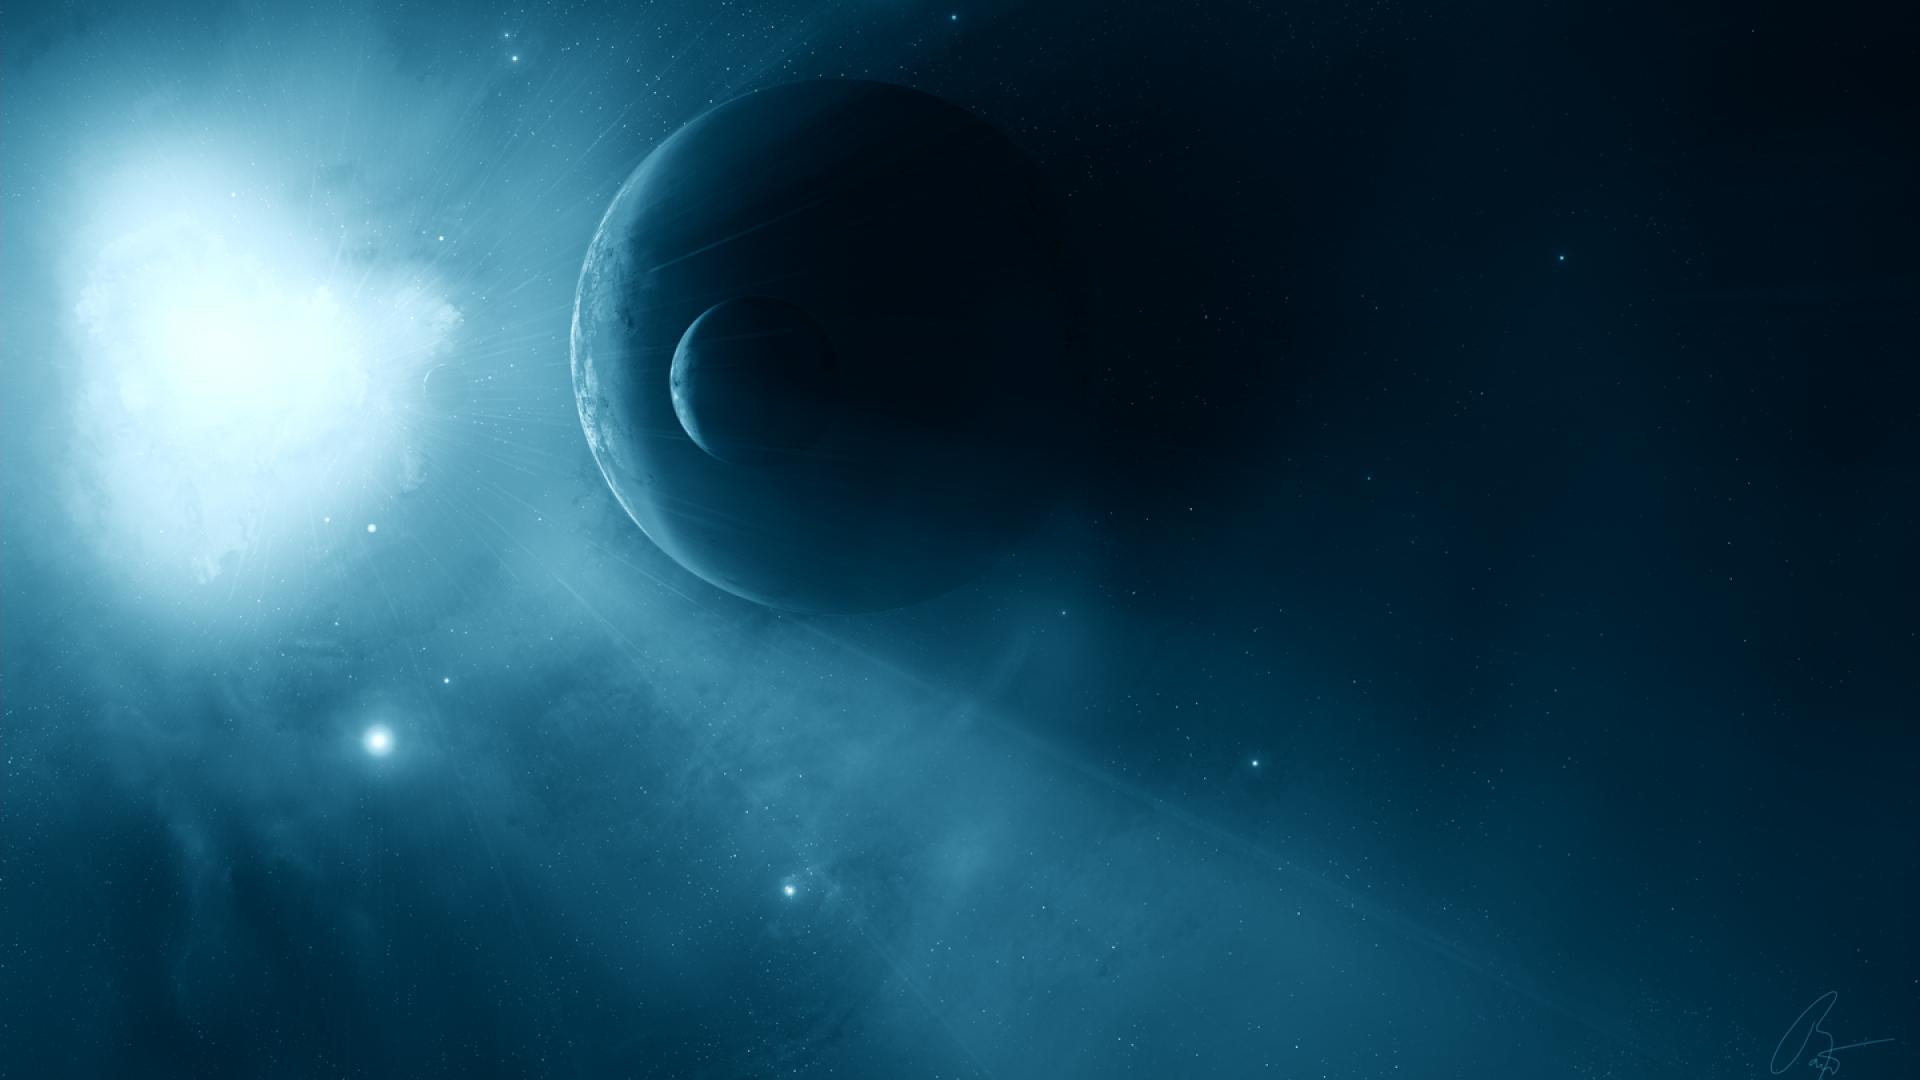 supernova wallpaper widescreen-#26